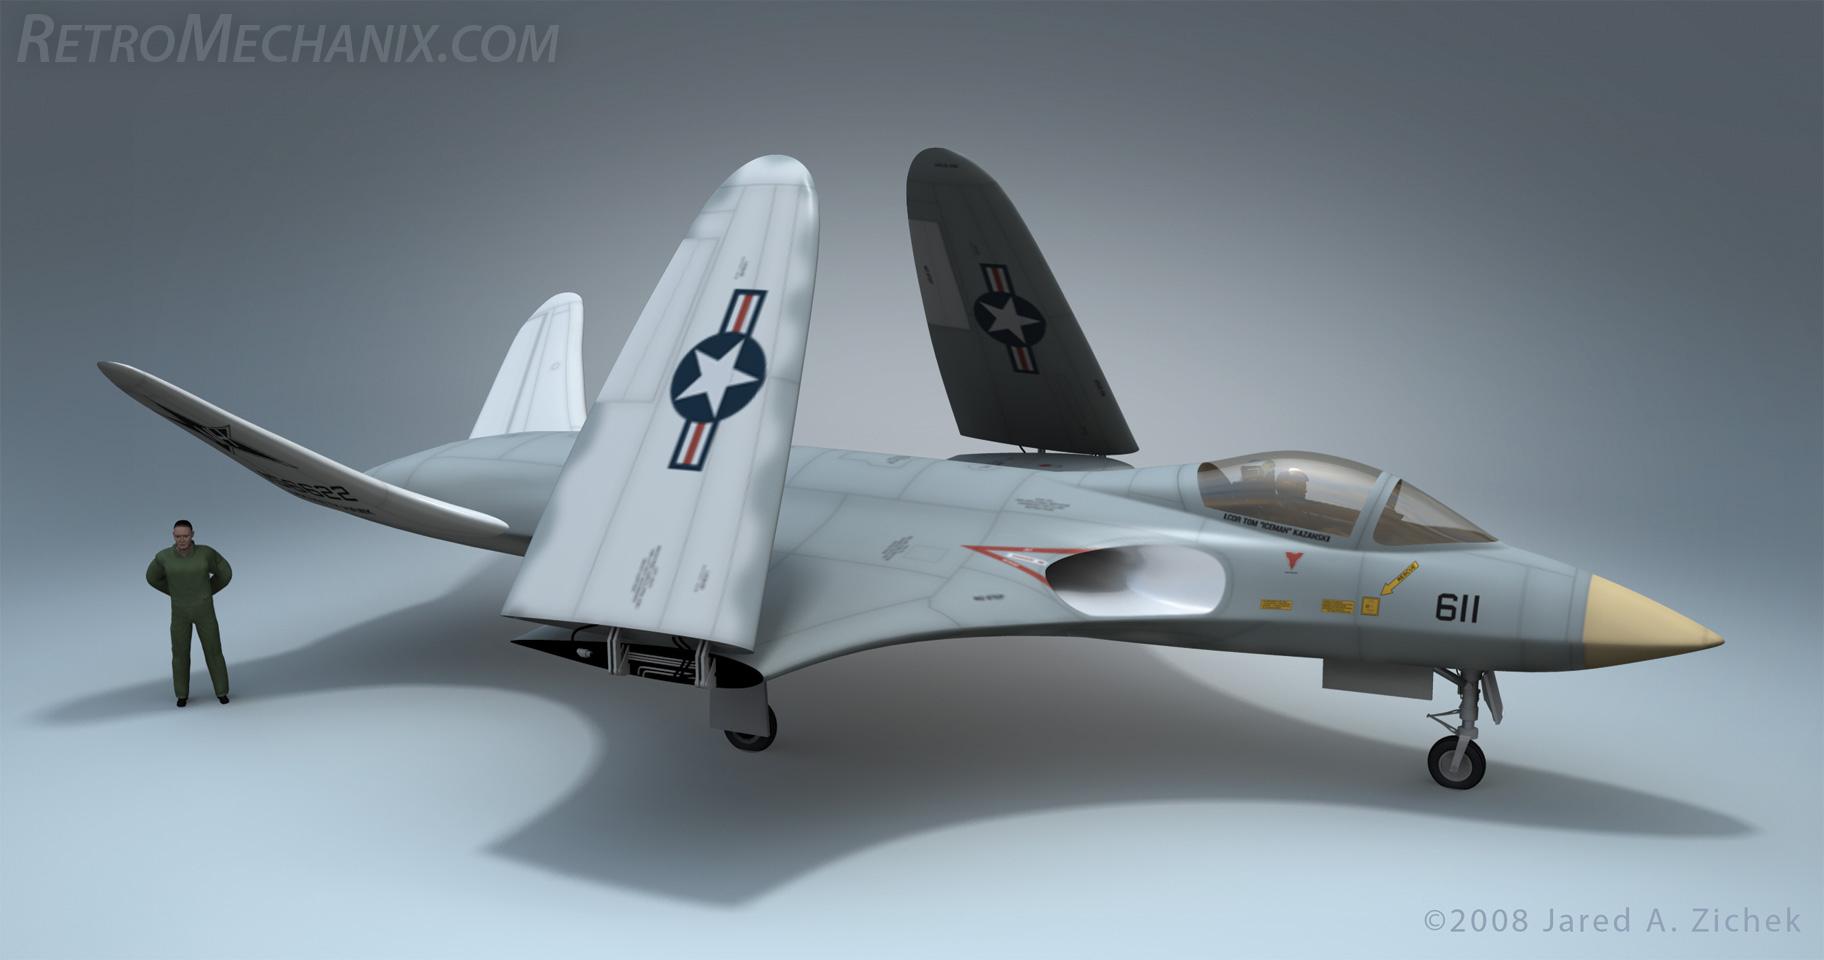 mcdonnell-model-226-458-folded-a.jpg